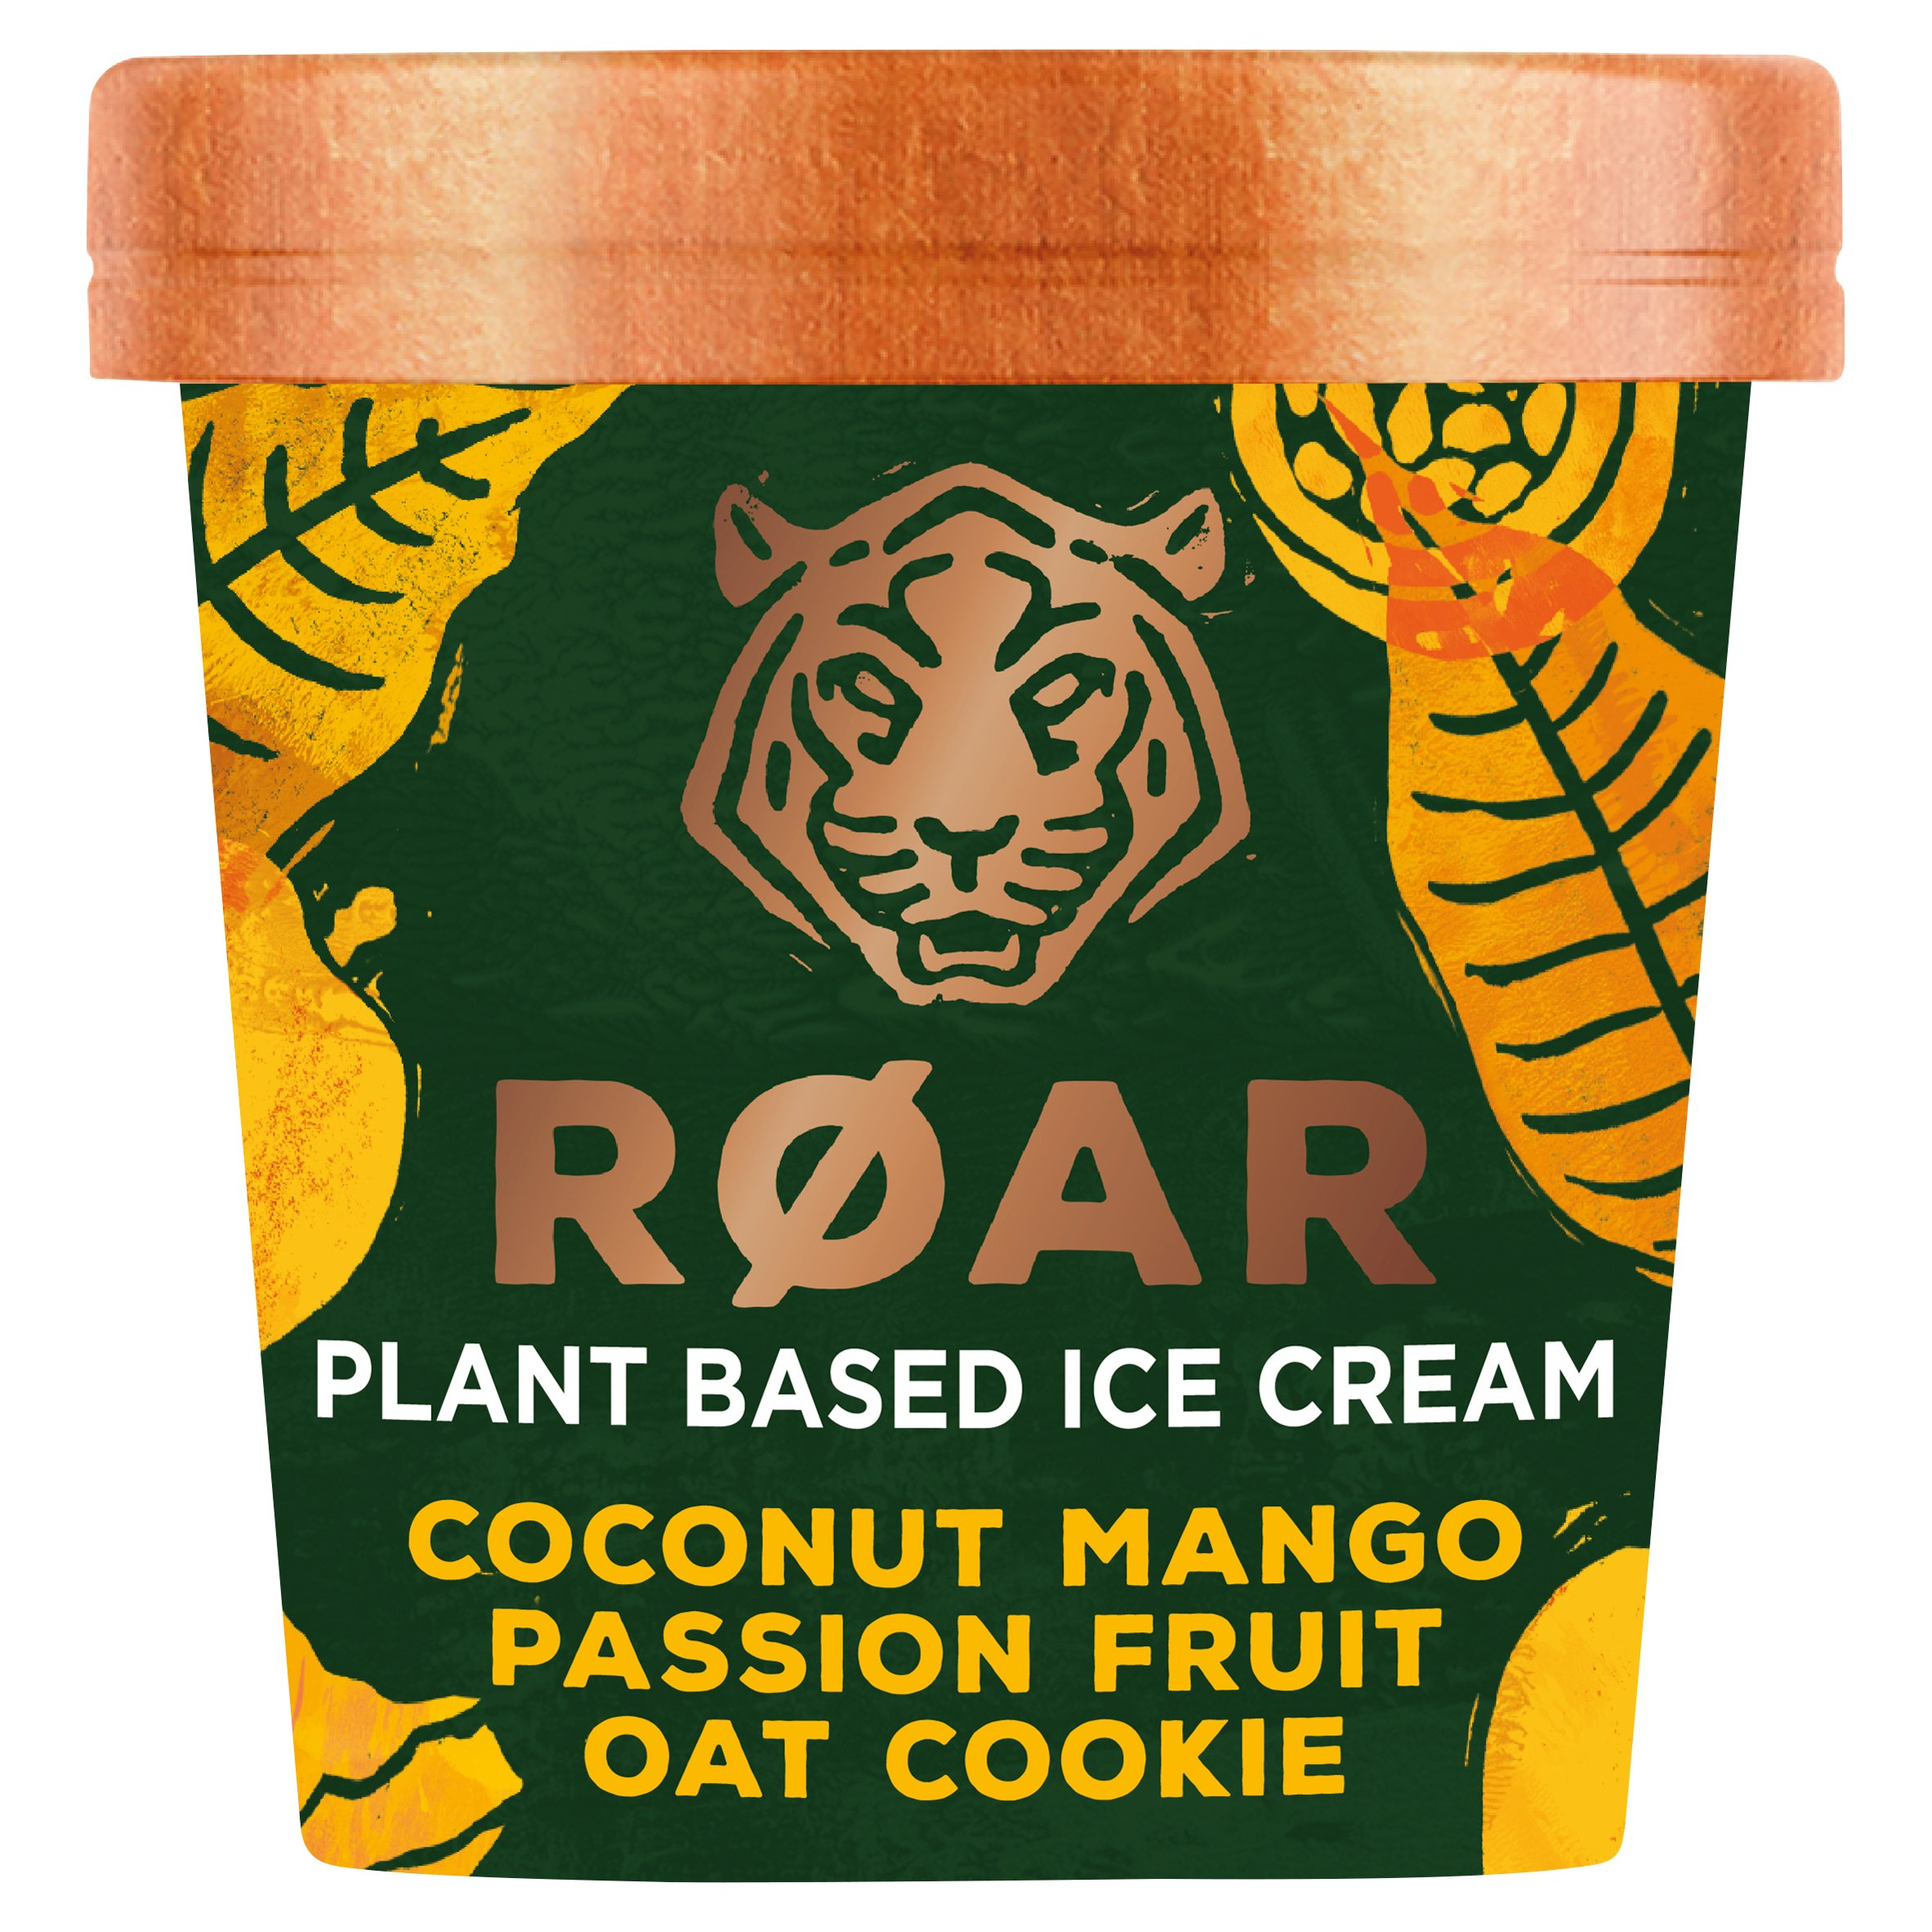 Roar Coconut Mango Passion Fruit Oat Cookie Ice Cream 500Ml